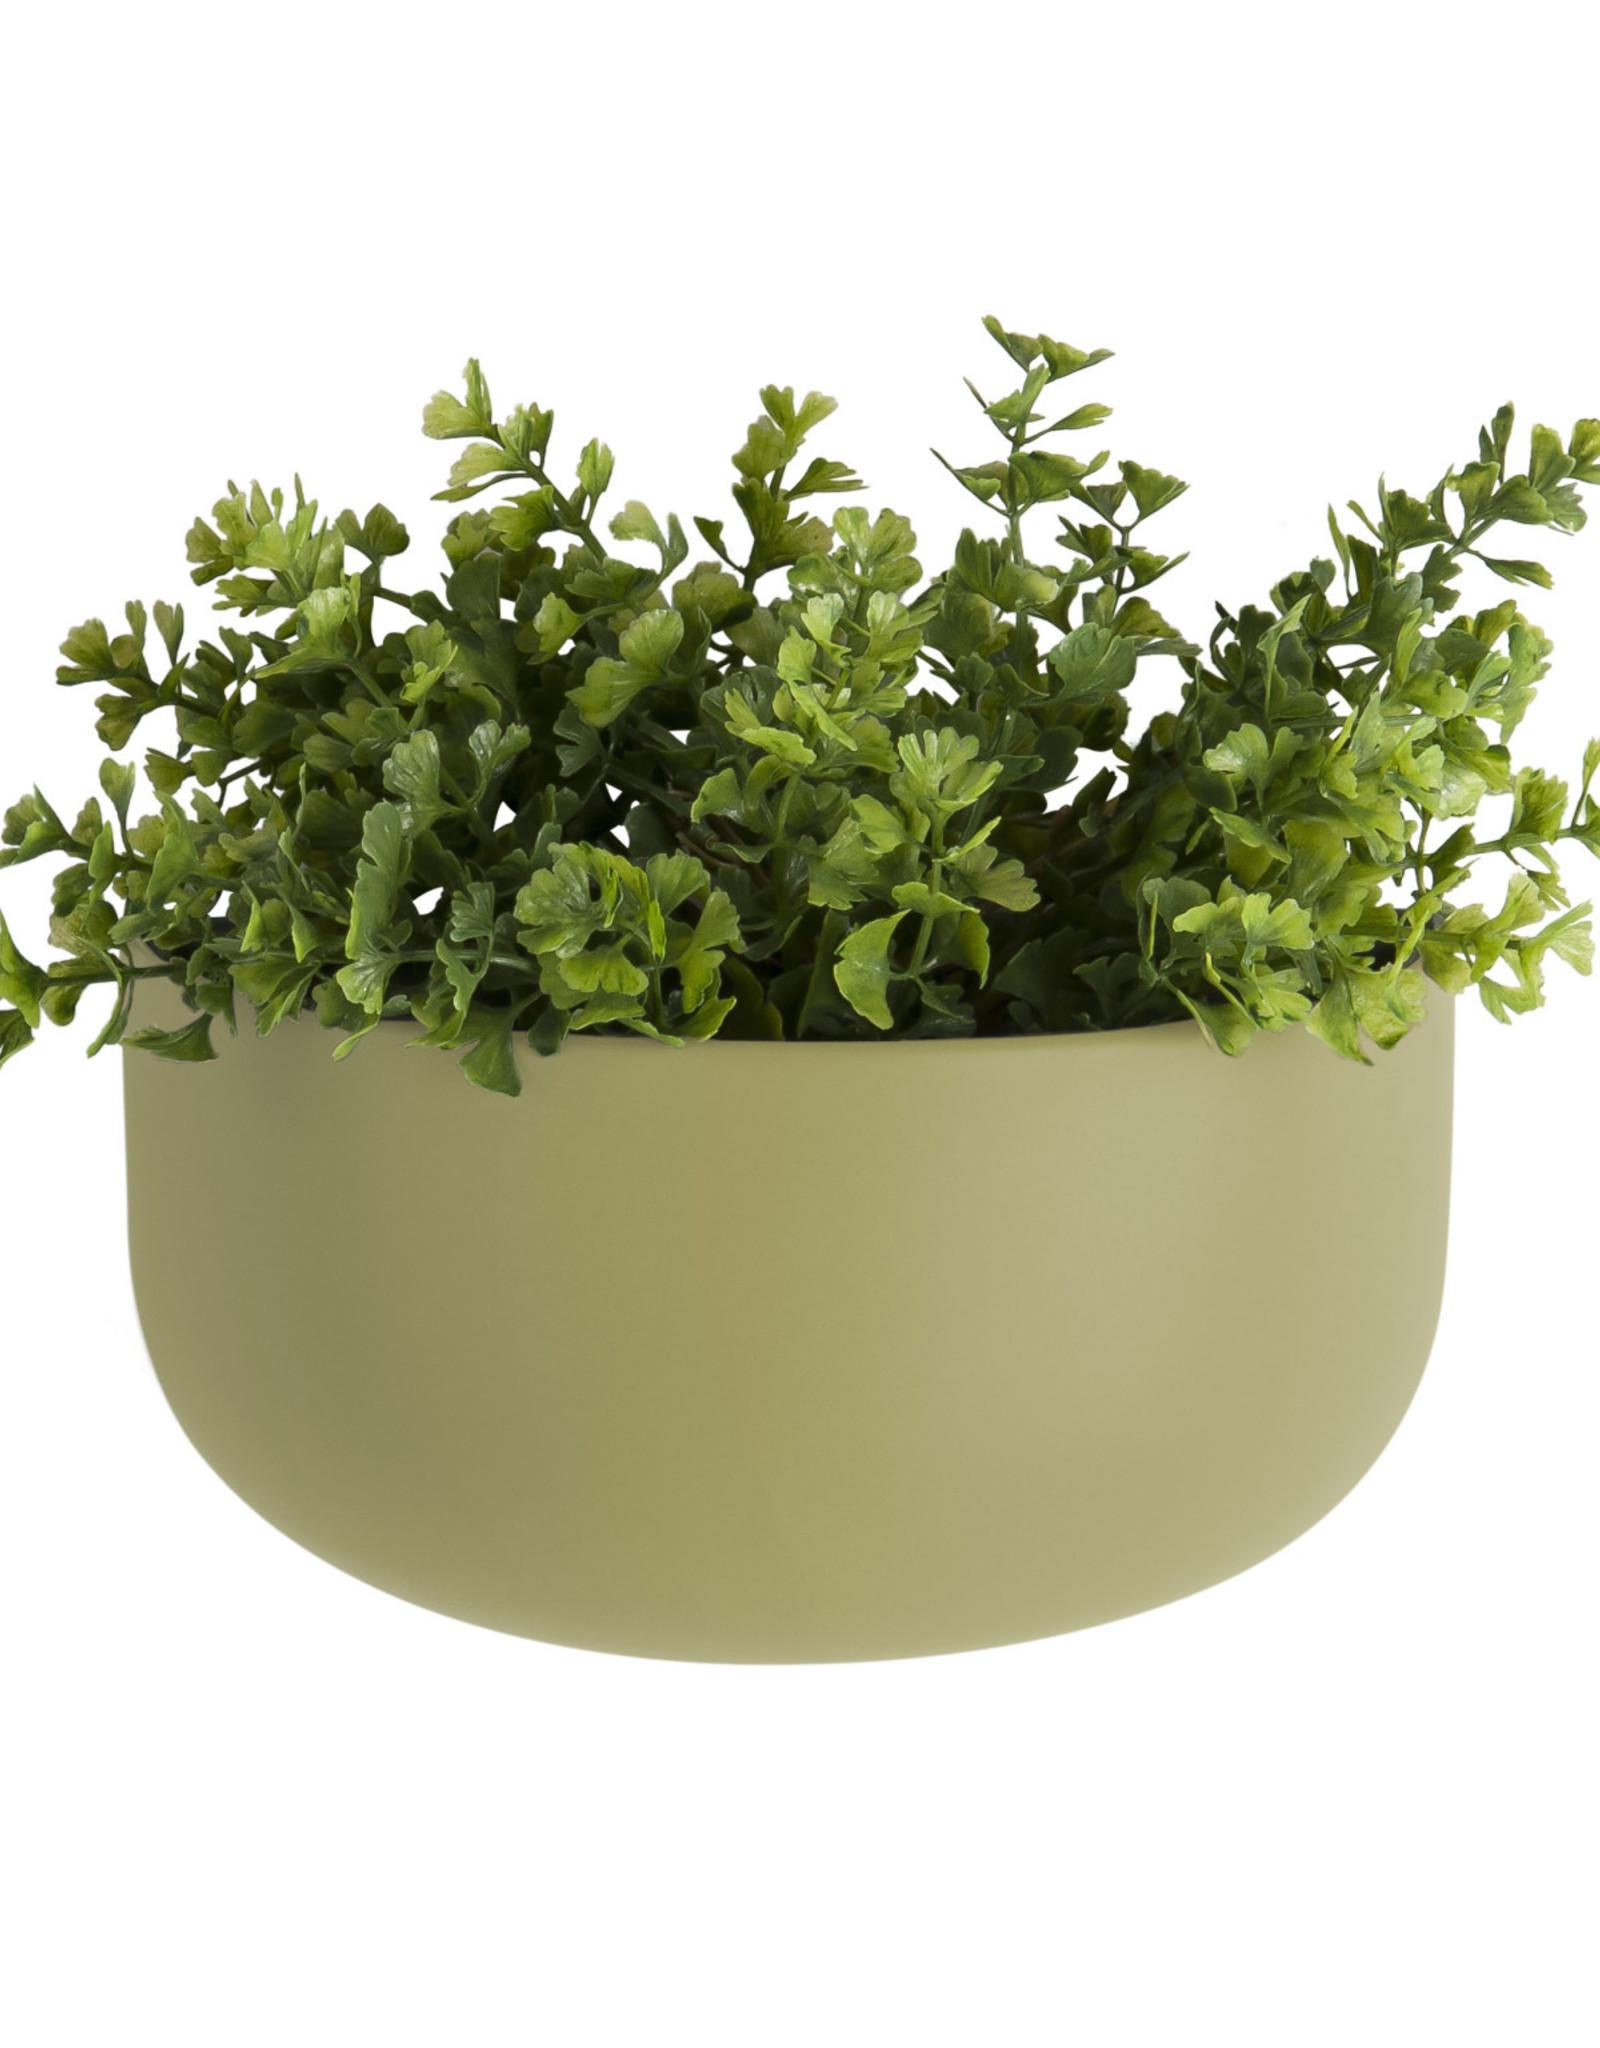 pt Wall Pot Oval Ø7x16 h10.5 cm - Olive Green